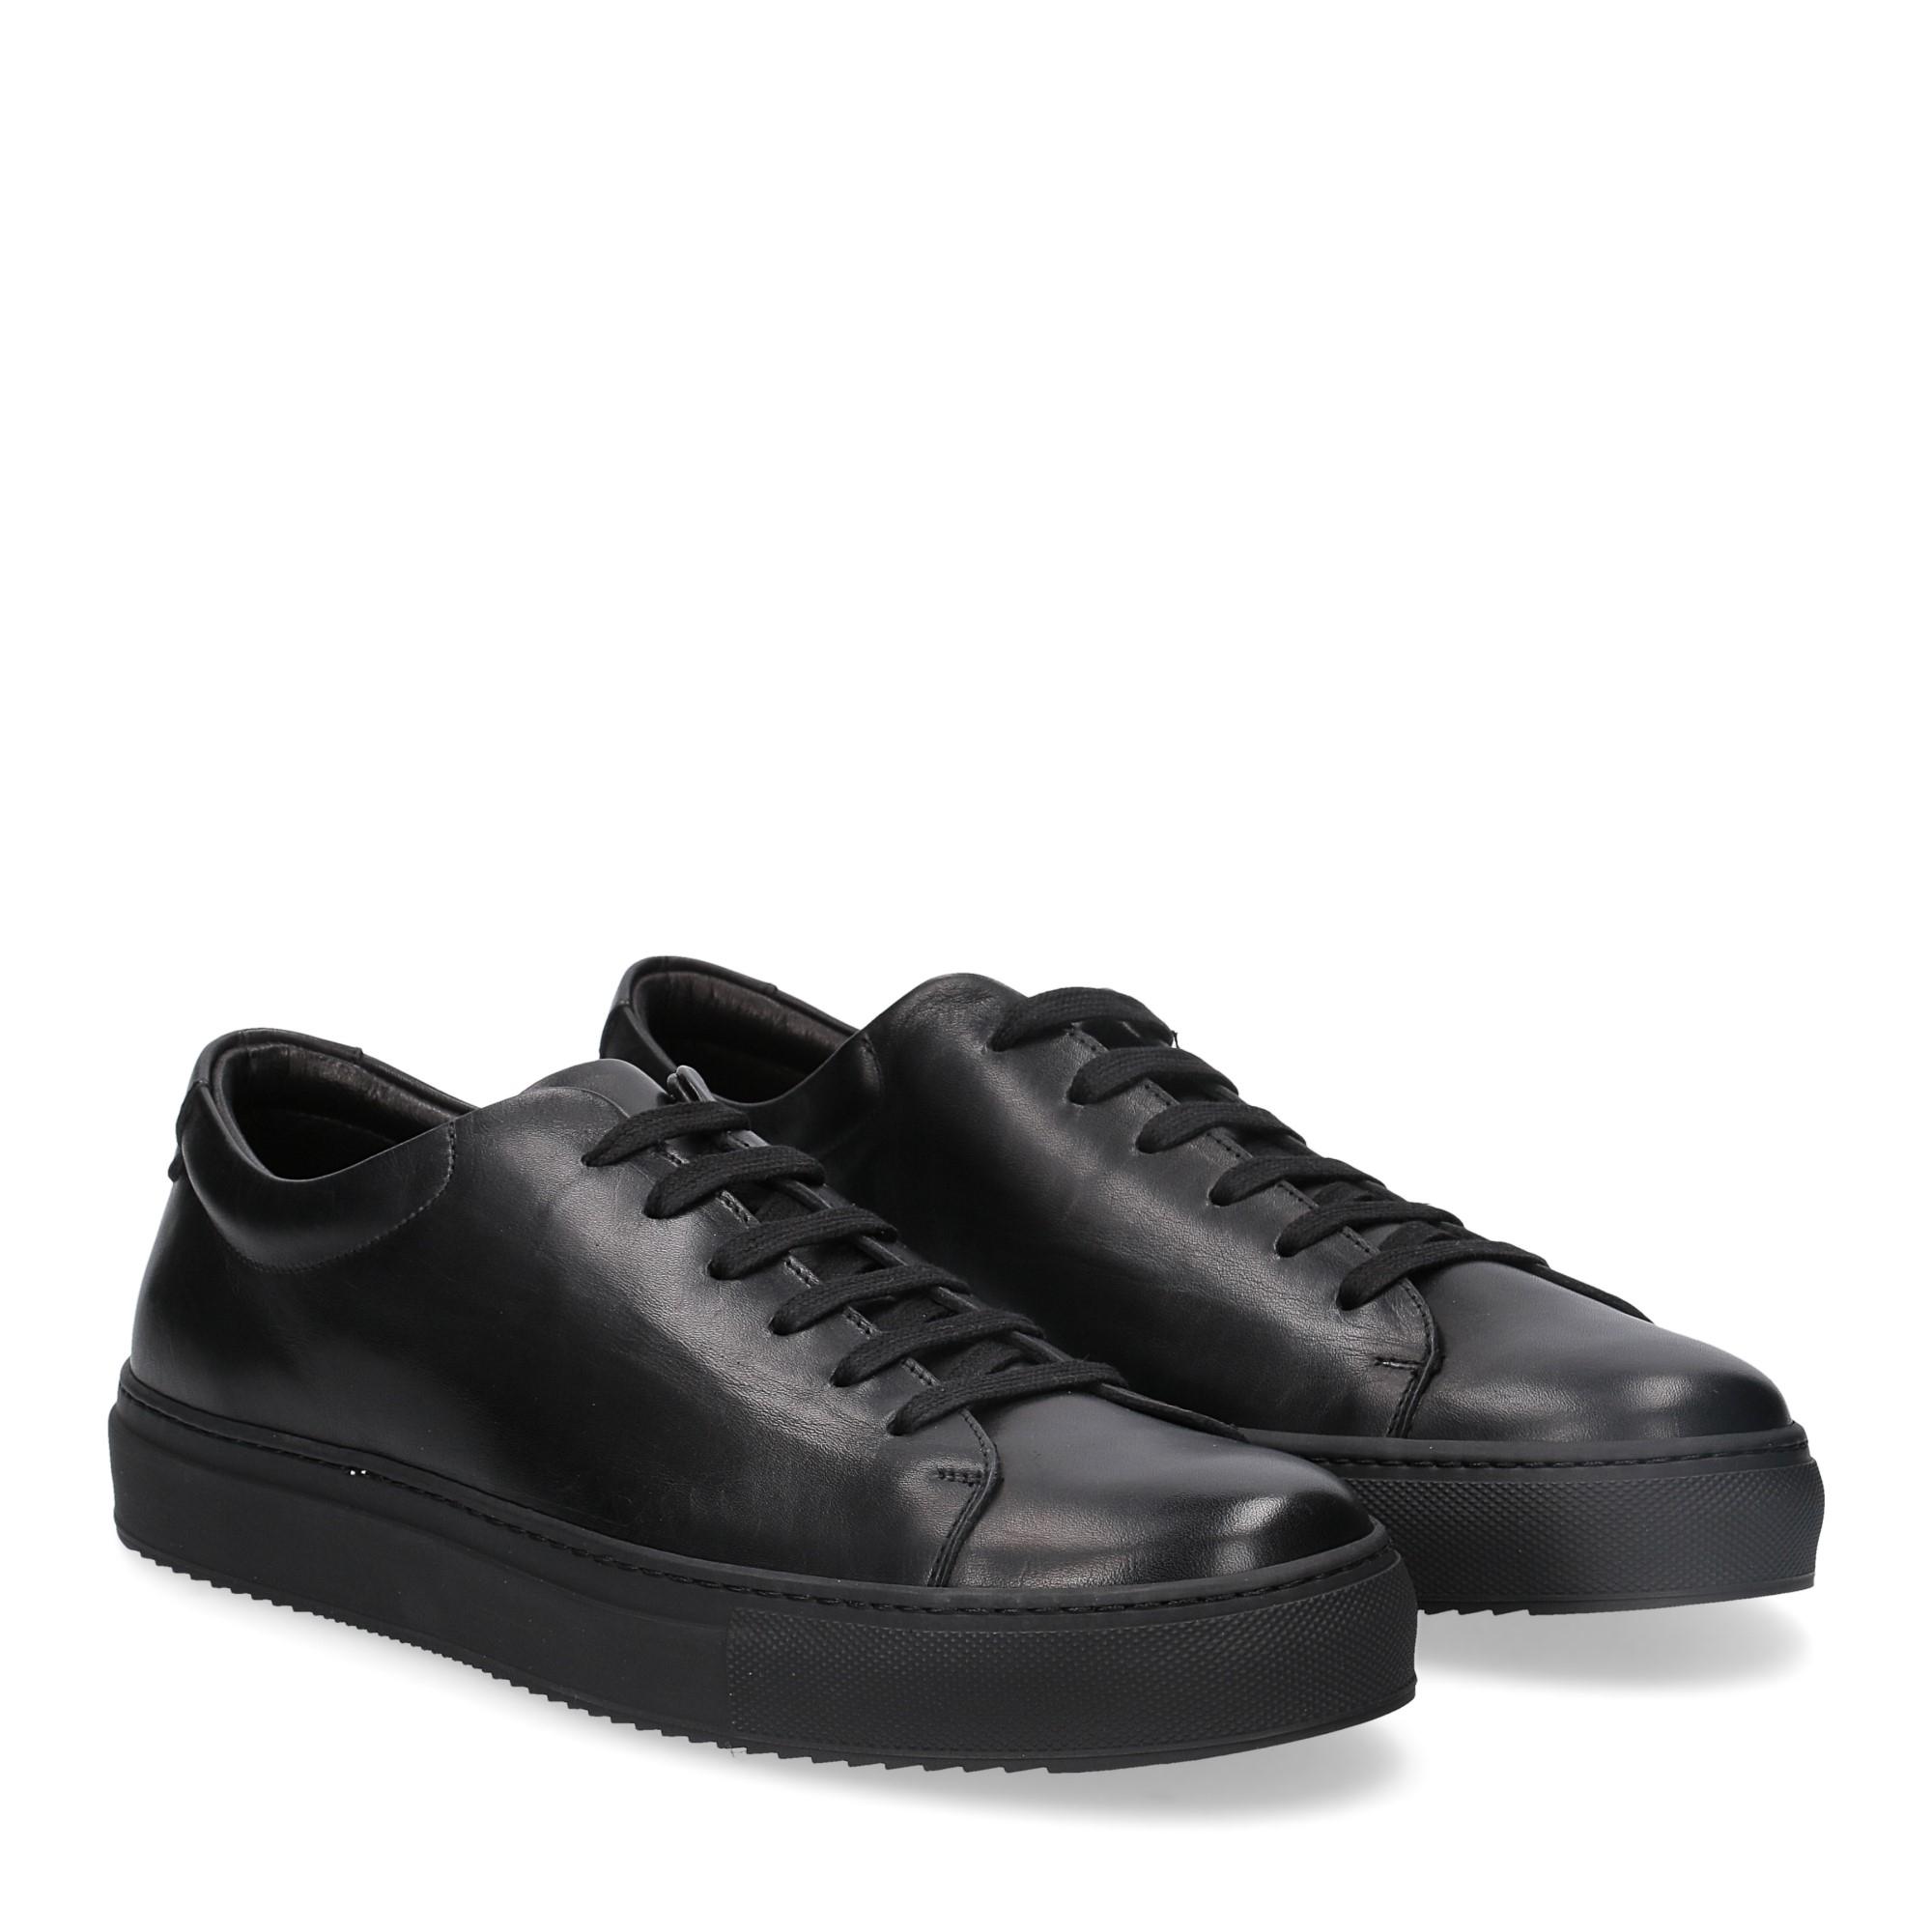 Griffi's sneaker vitello nero